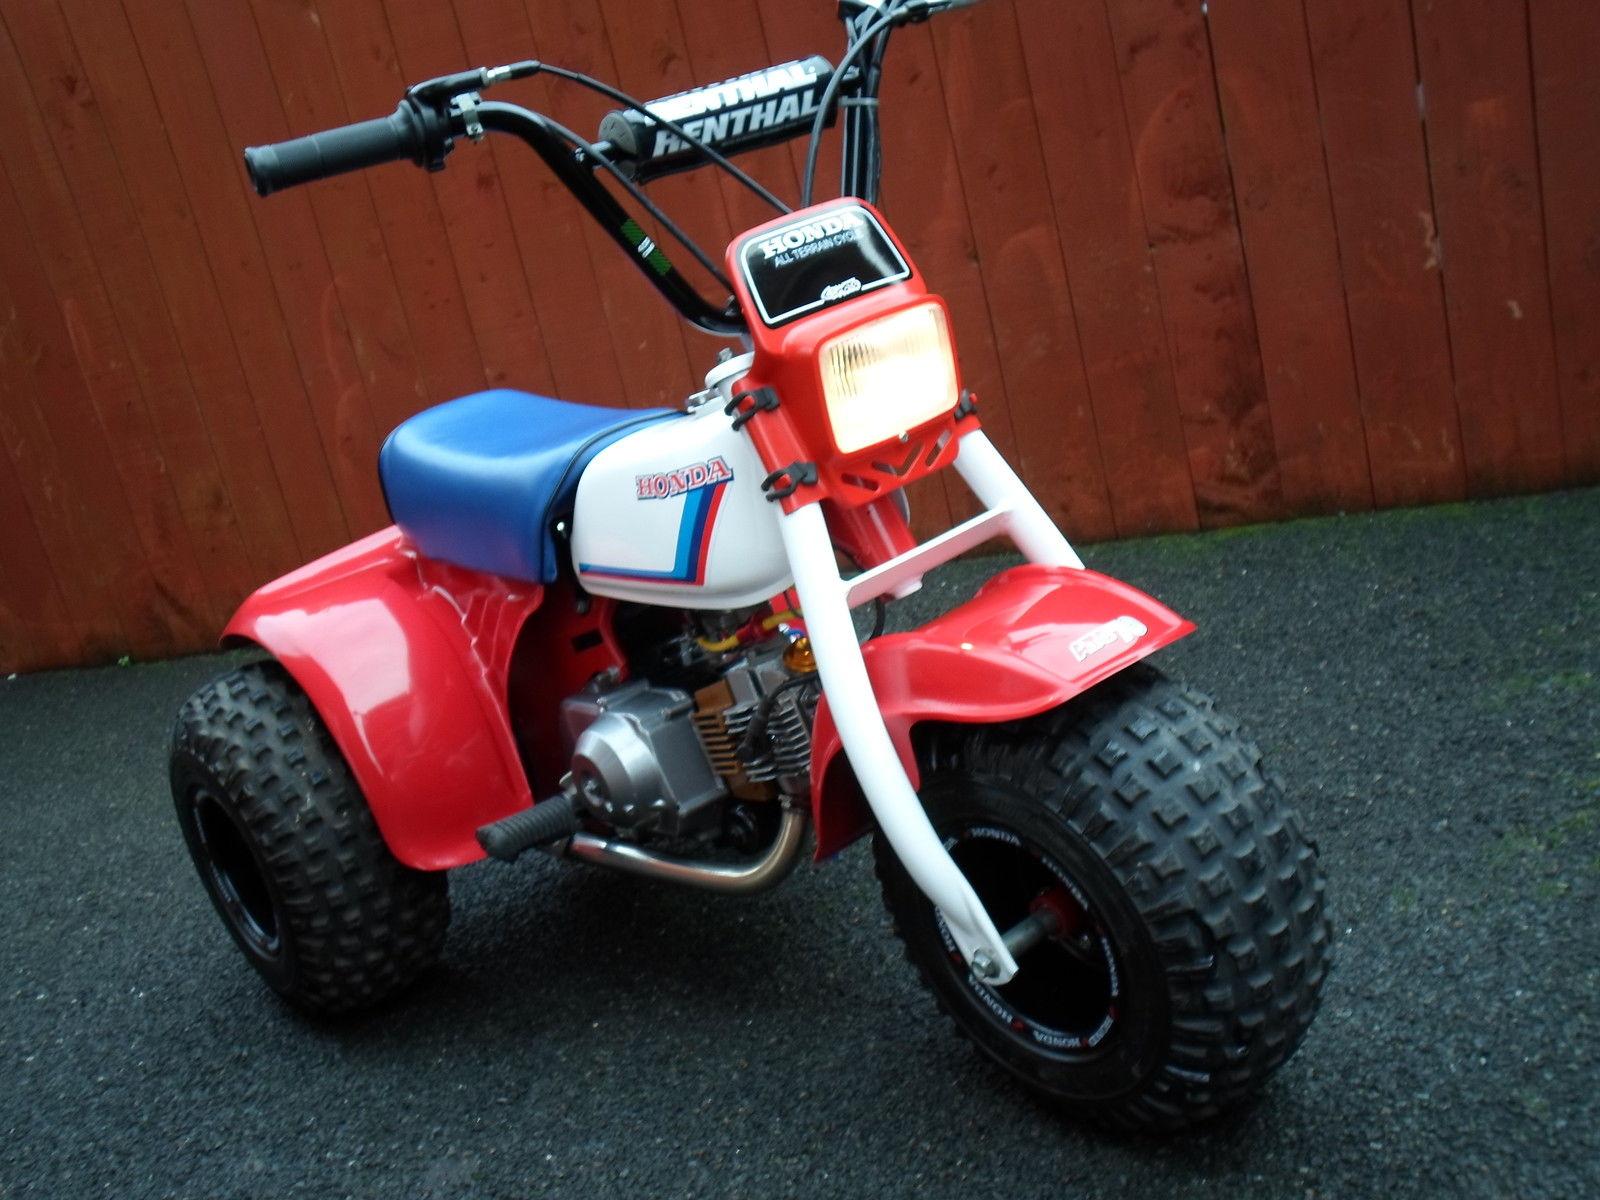 Honda Atc 70 : Honda atc monkeybike restored